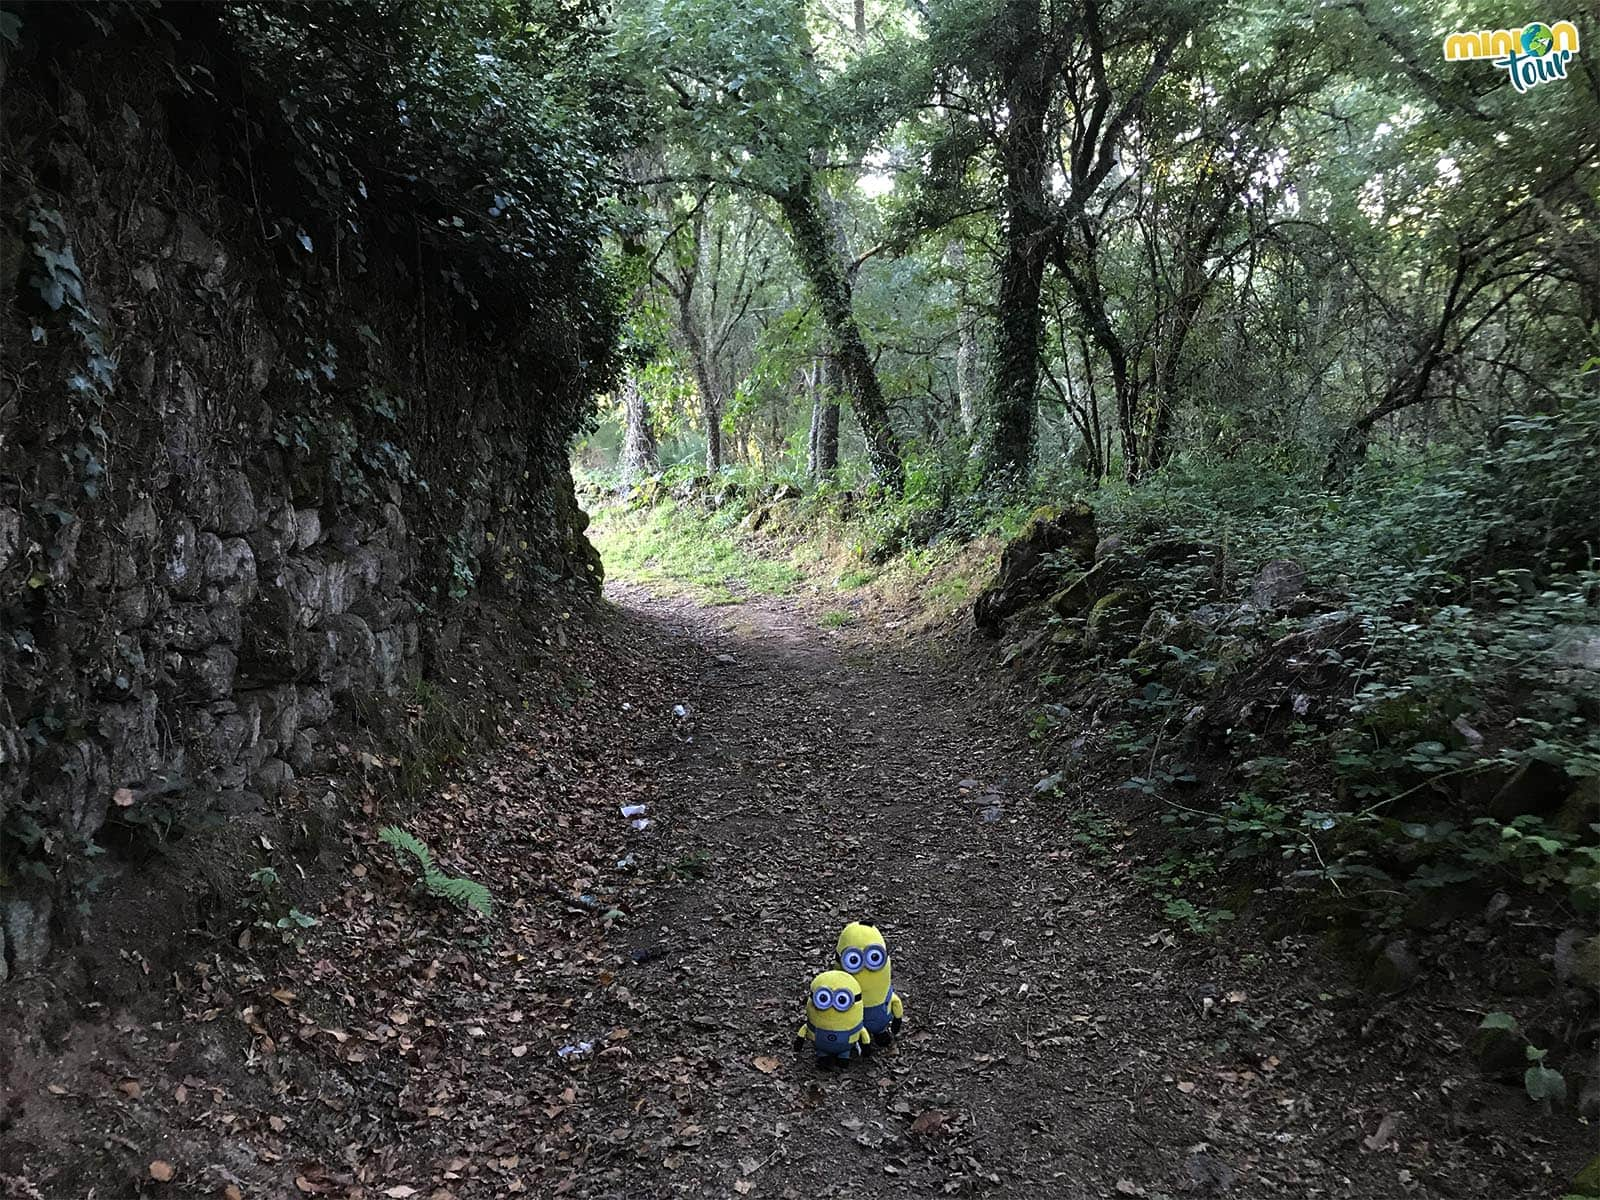 Otro rincón del sendero